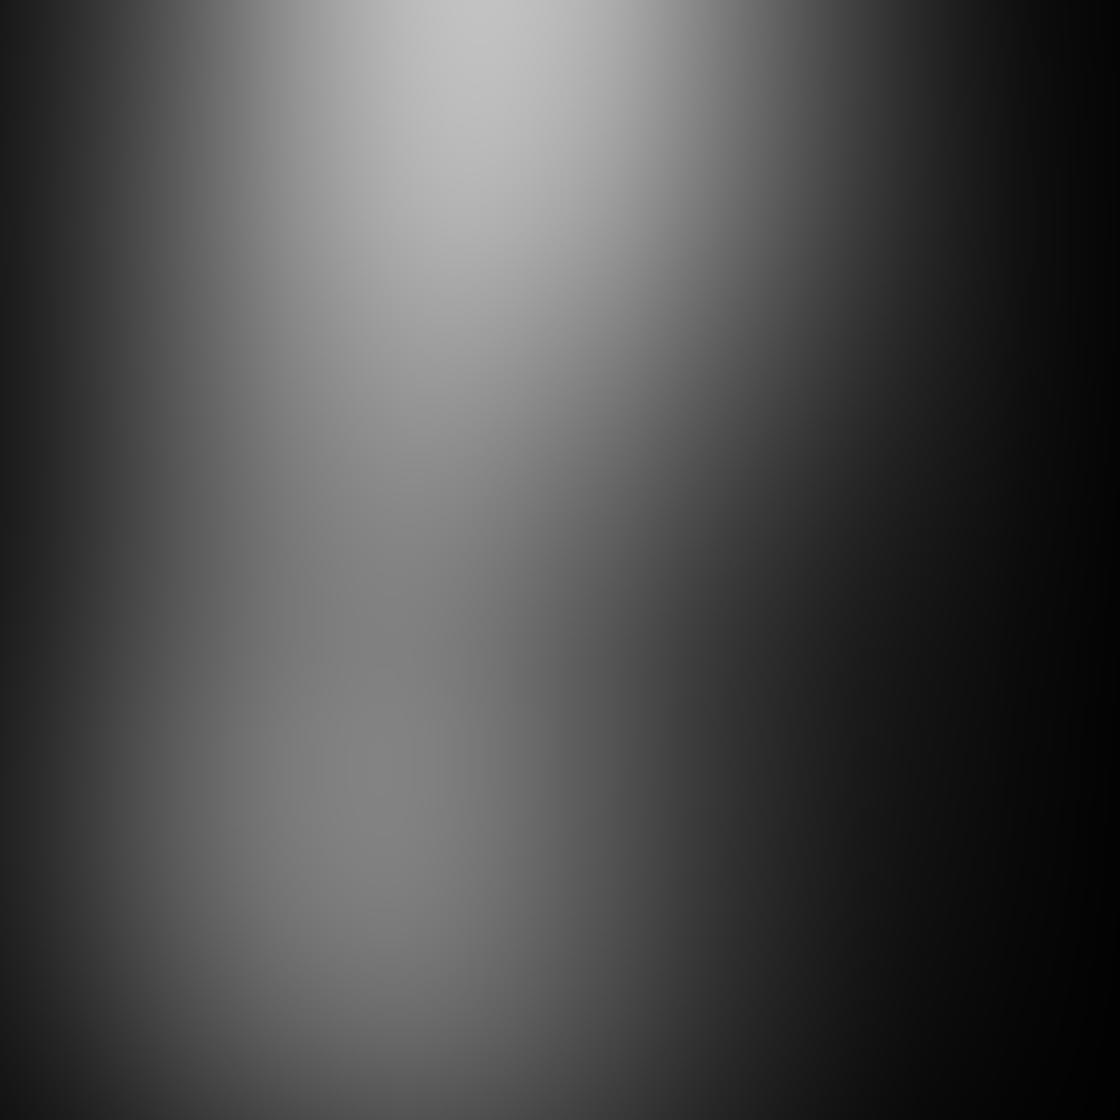 iPhone Silhouette Photos 7